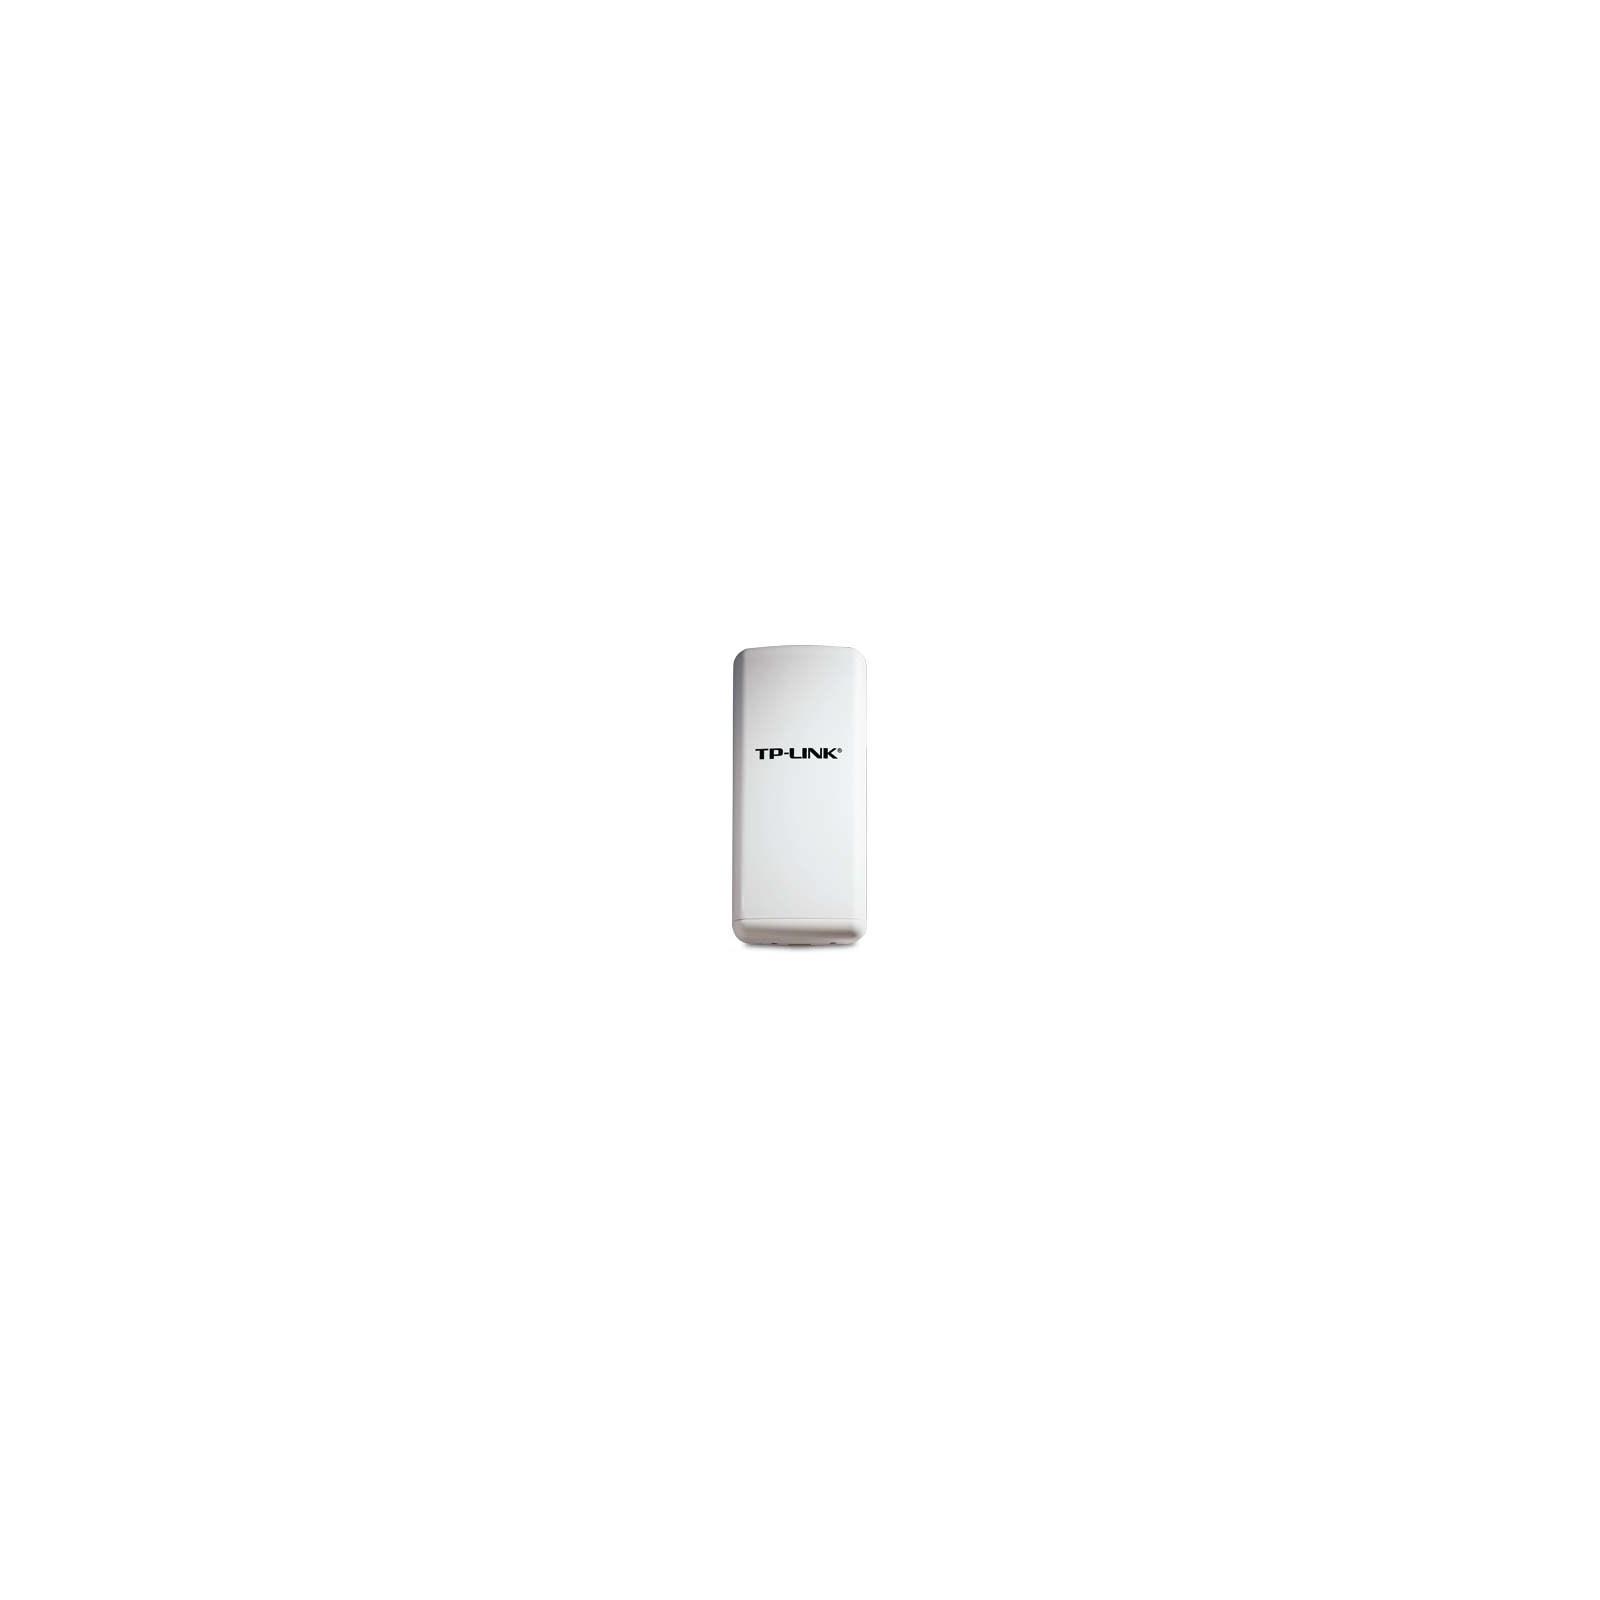 Точка доступа Wi-Fi TP-Link TL-WA5210G